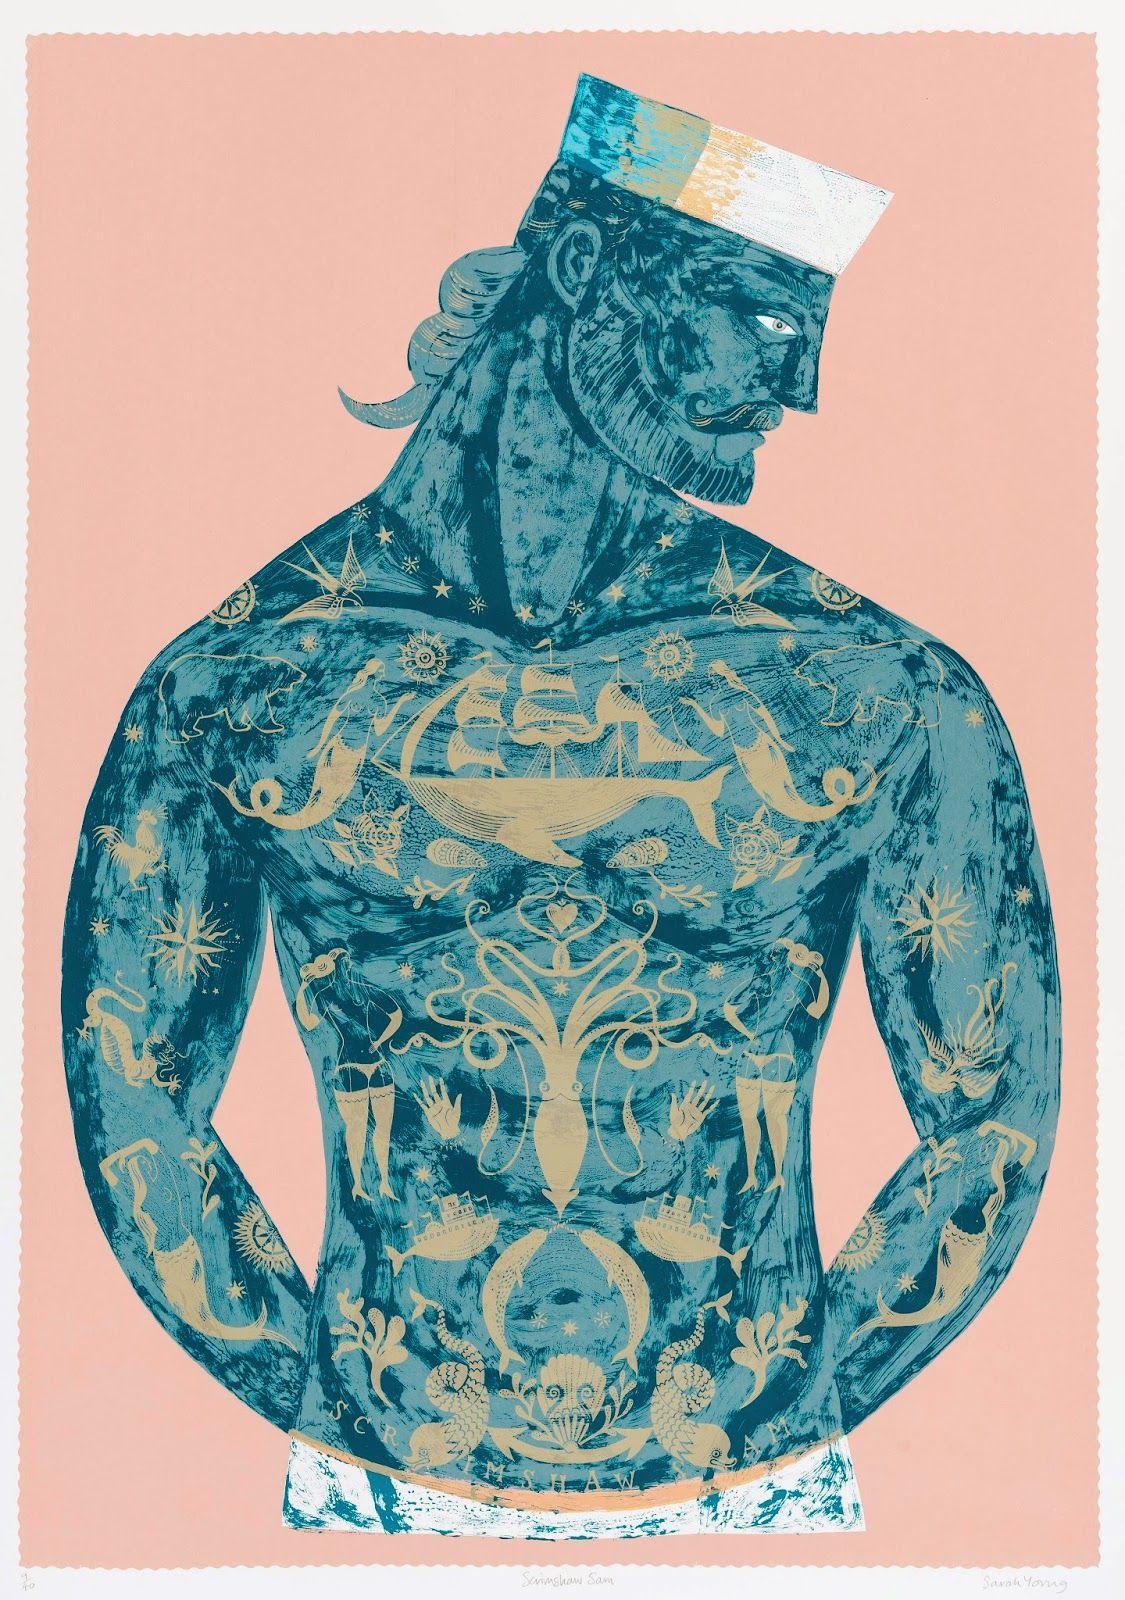 Scrimshaw Sam By Sarah Young Silk Screen Print Brighton UK 2015